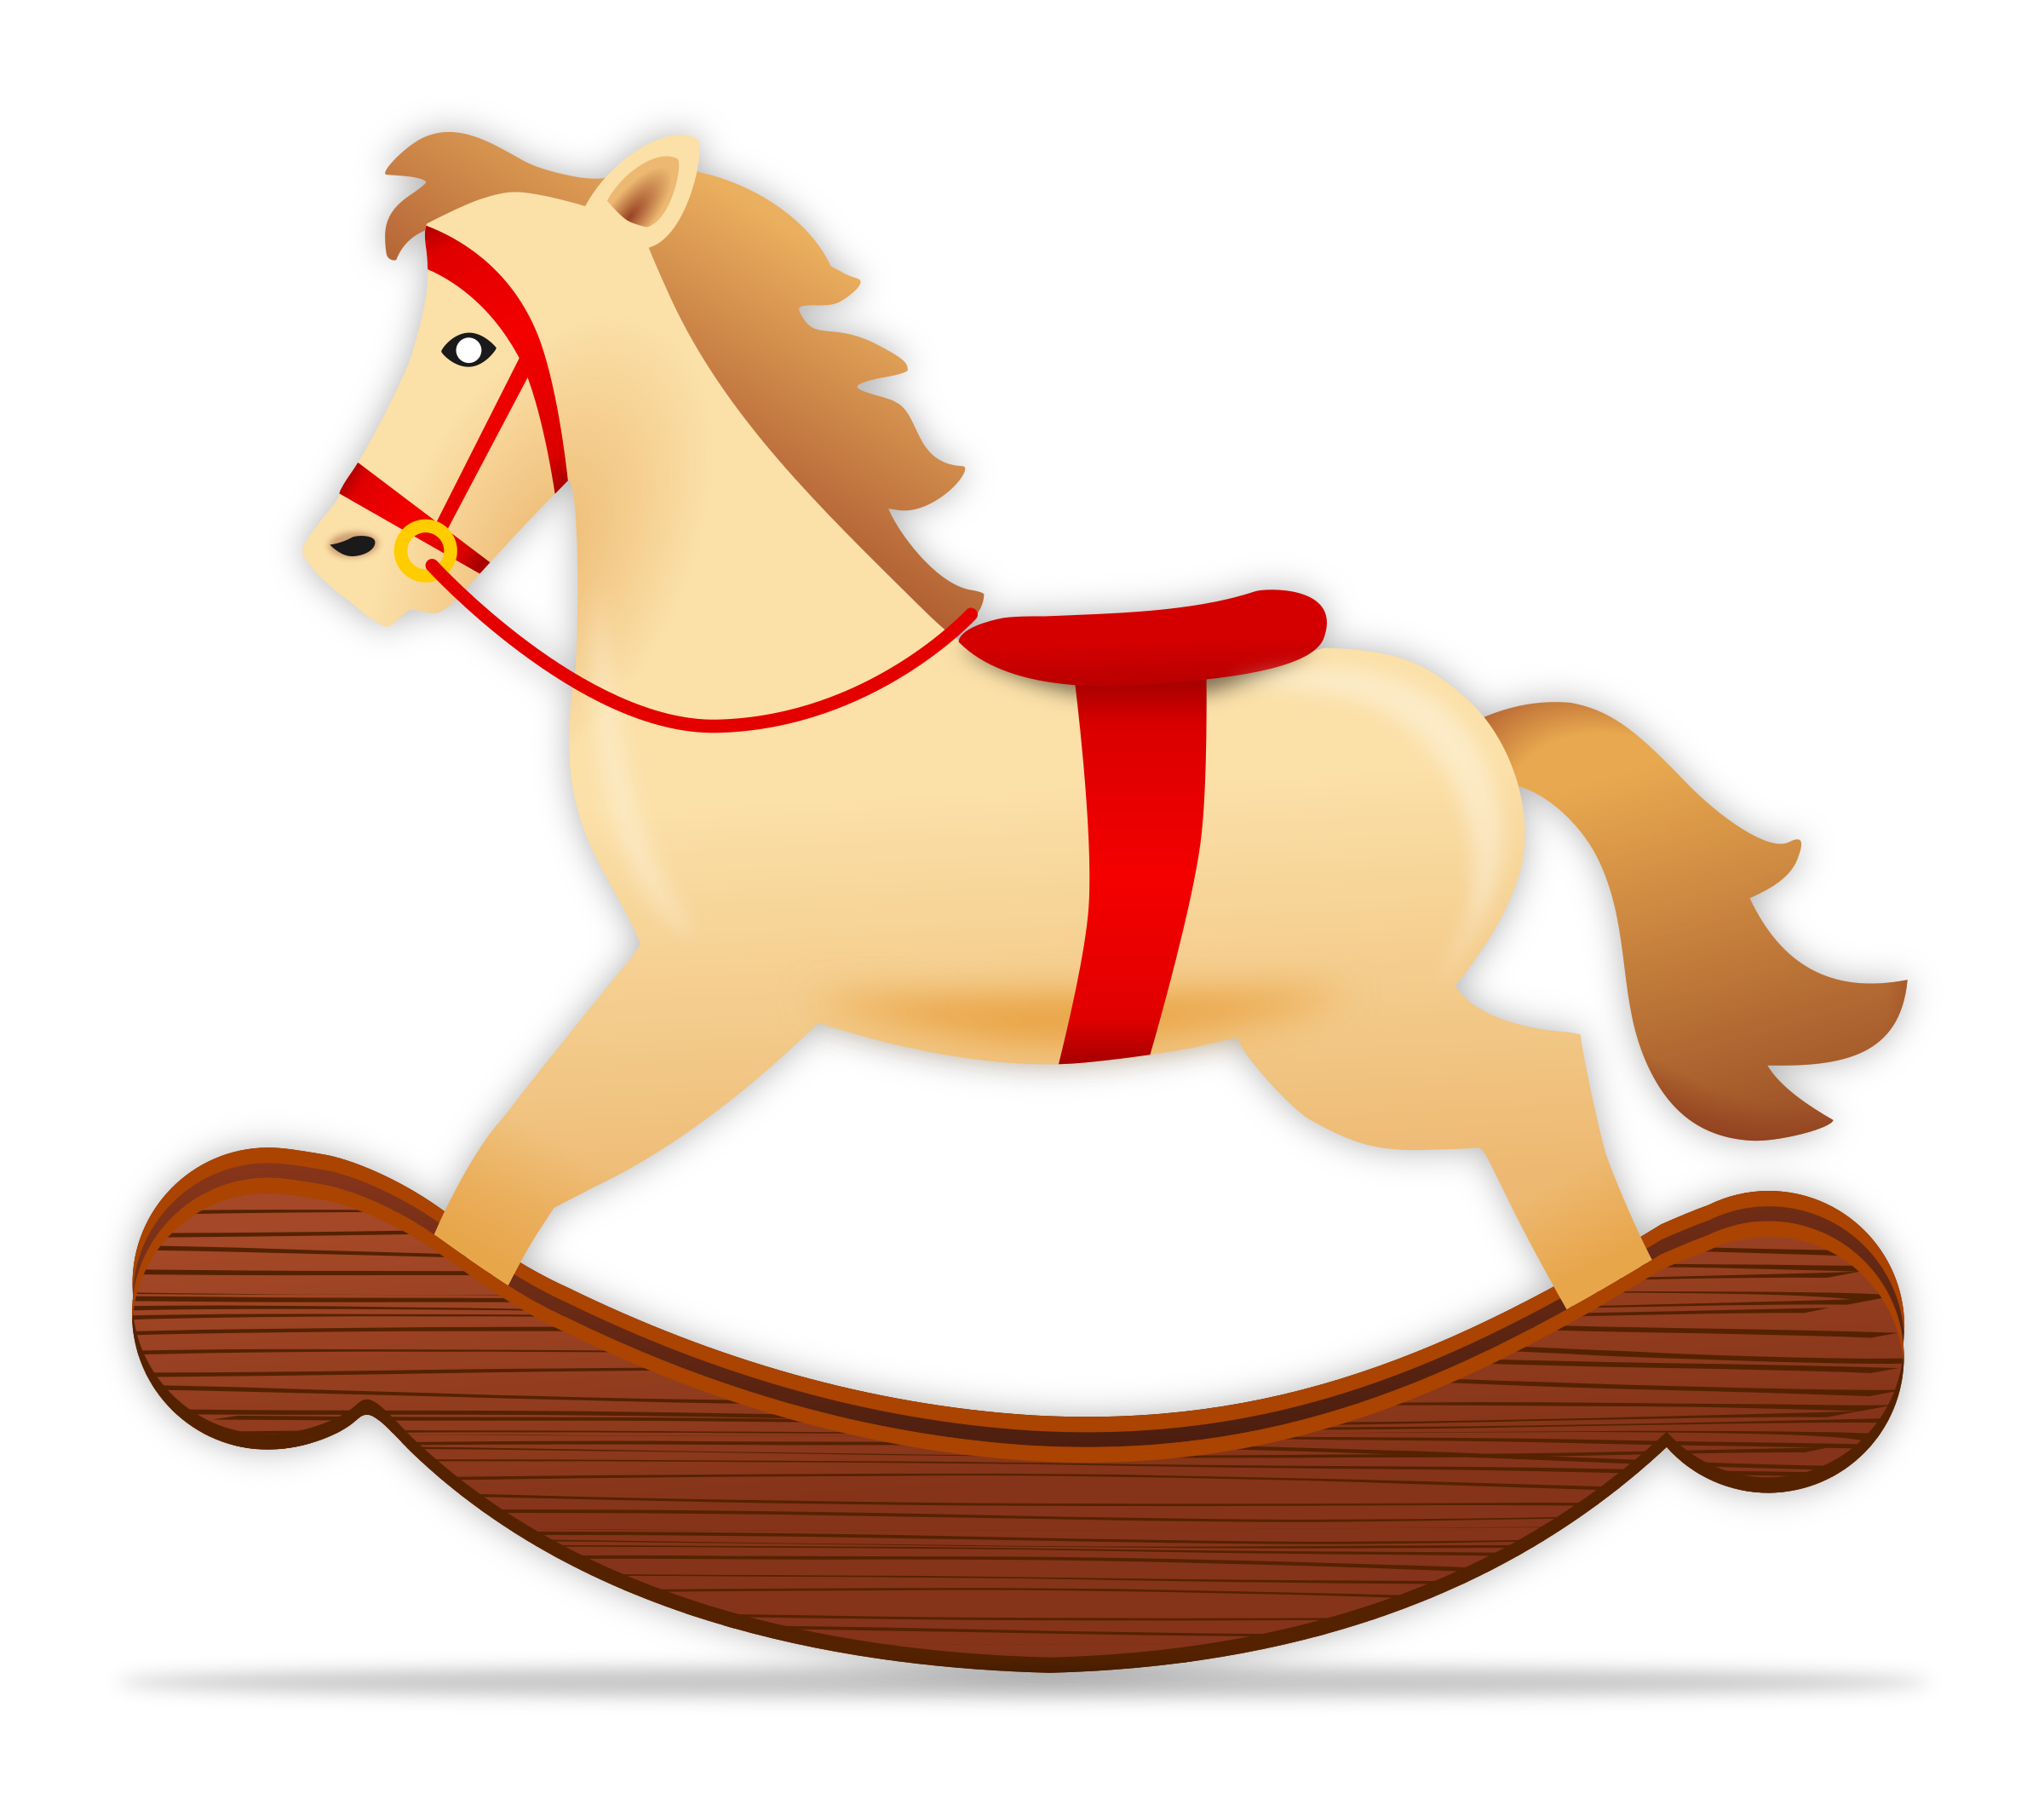 Wood big image png. Horse clipart illustration